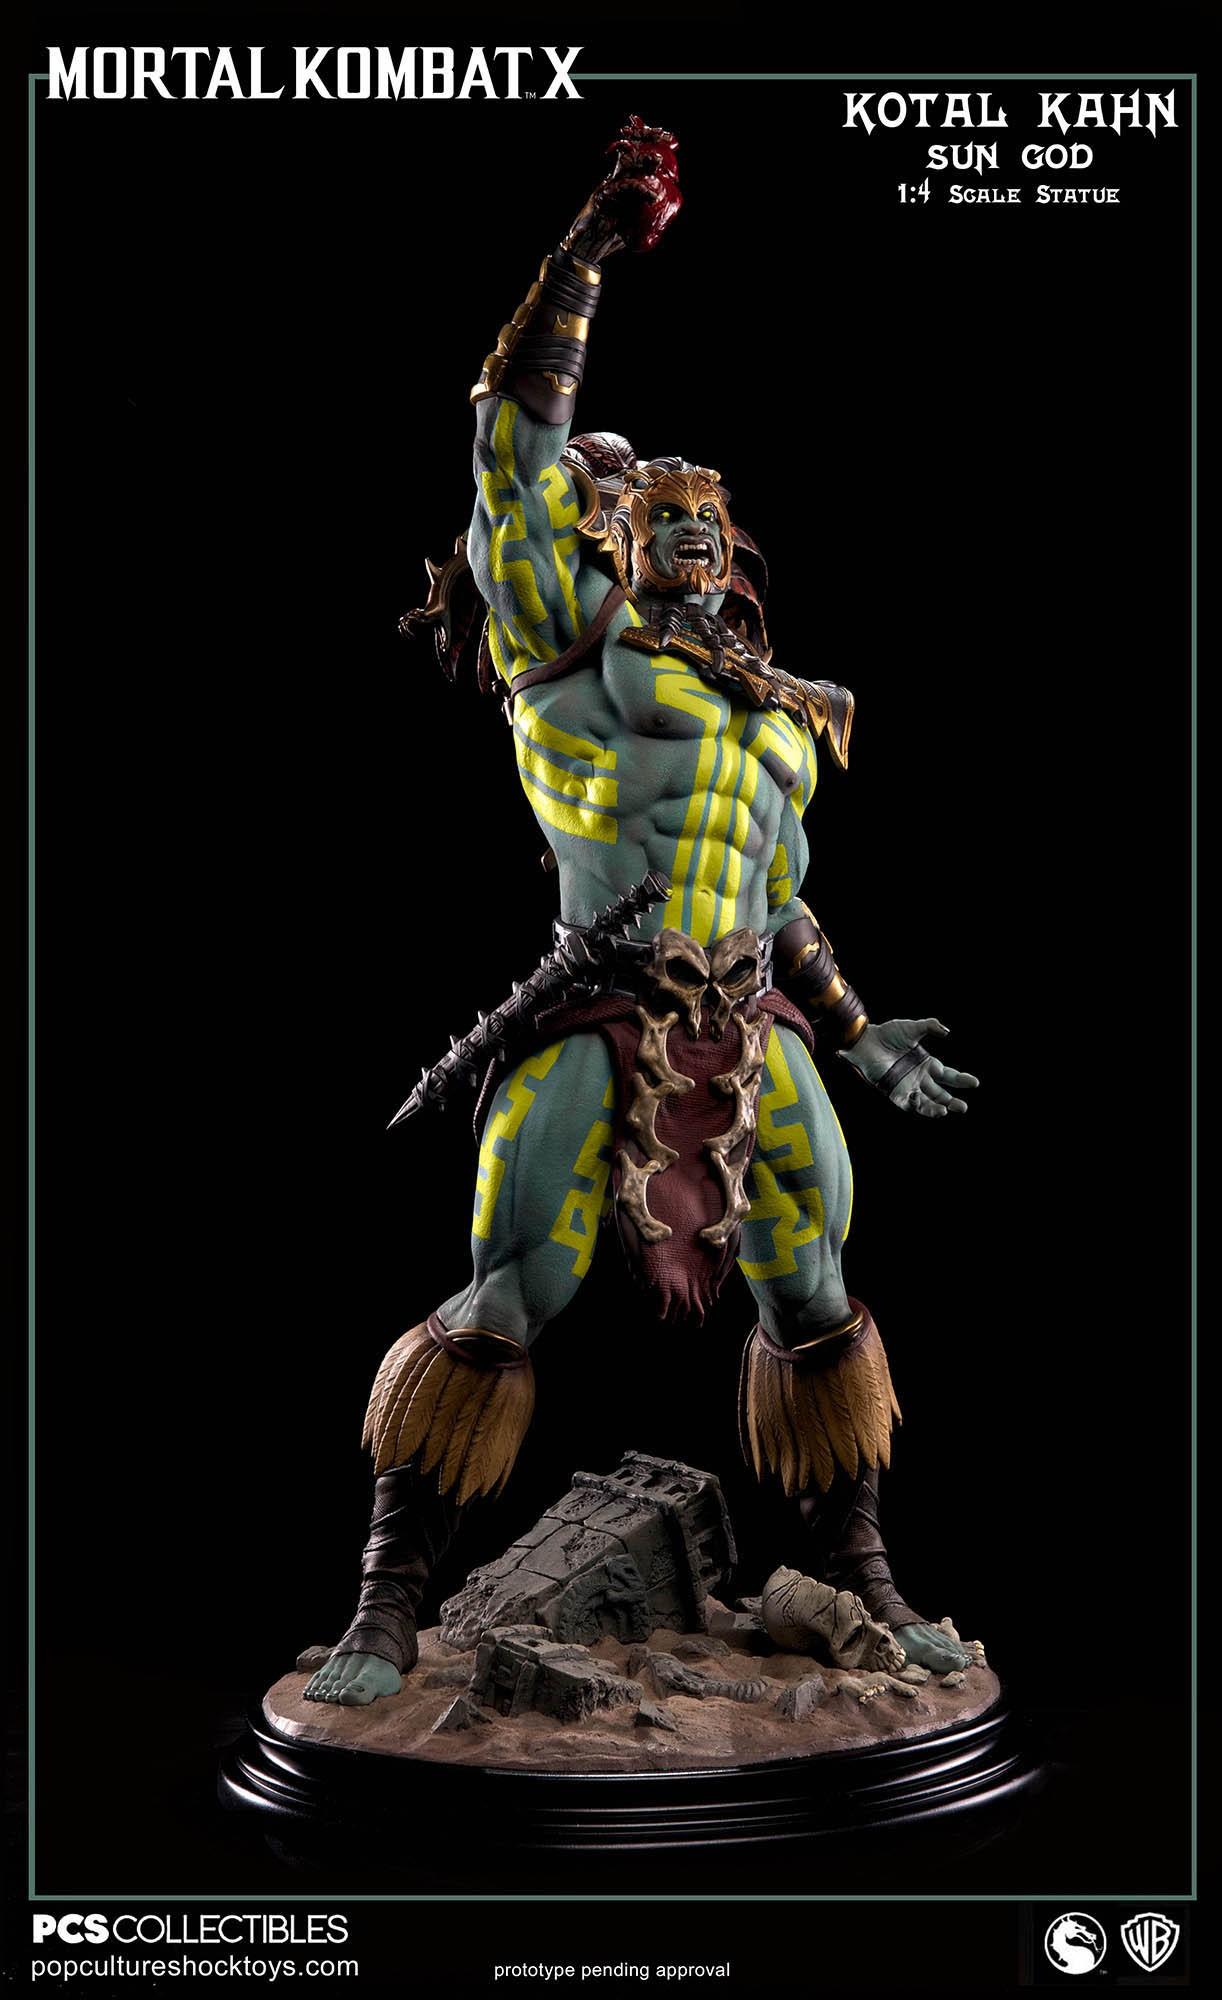 [Pop Culture Shock] Mortal Kombat X: Kotal Kahn 1:4 scale PCS-Kotal-Kahn-Sun-God-004